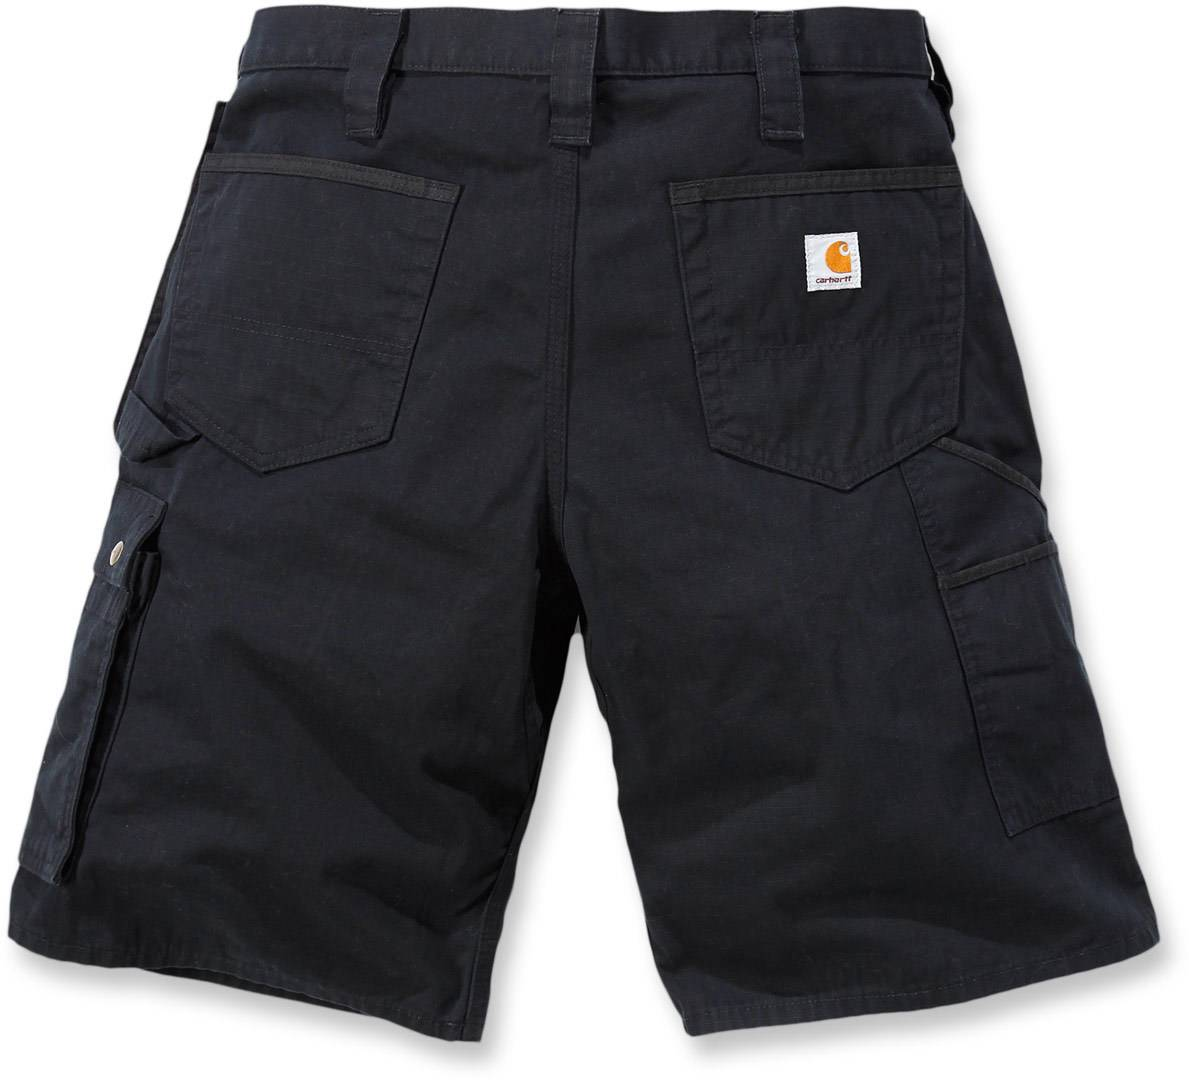 Carhartt Multi Pocket Ripstop Pantalones cortos Negro 36